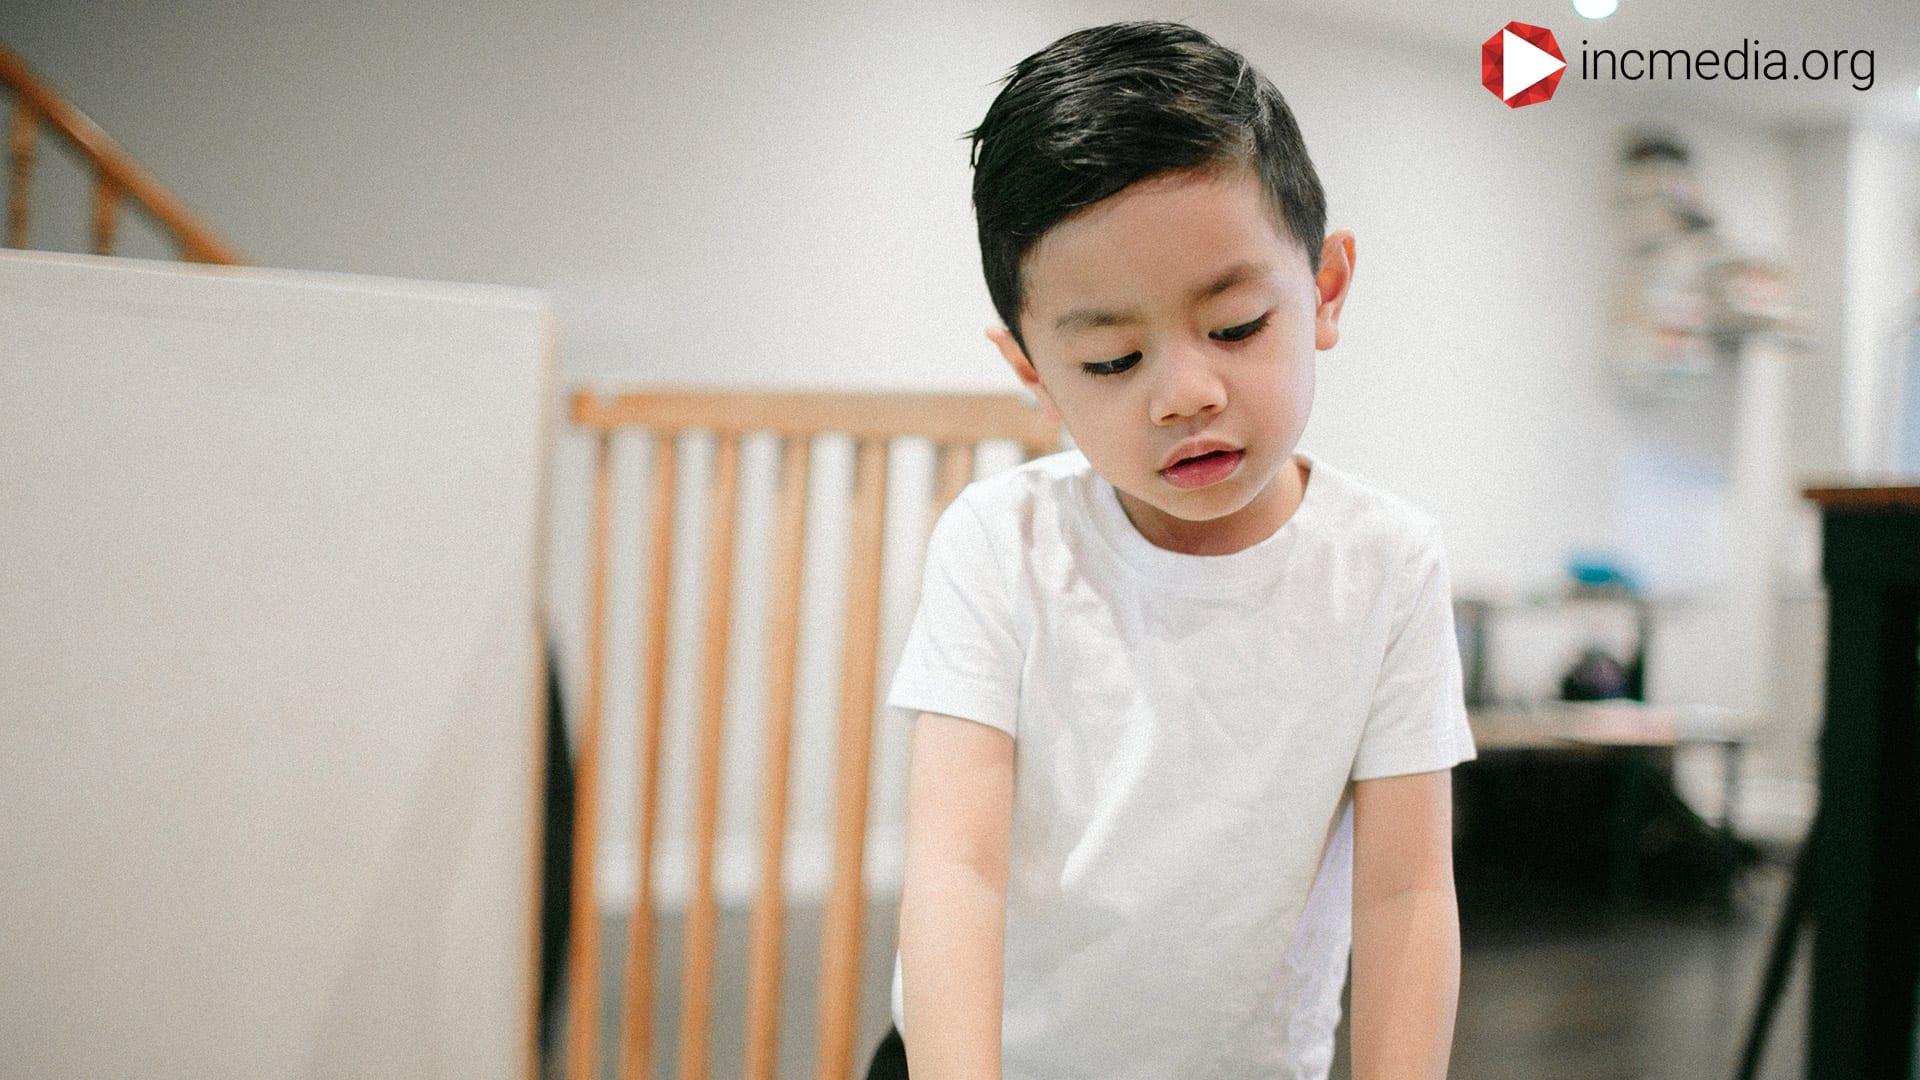 young boy looking down wearing a white shirt